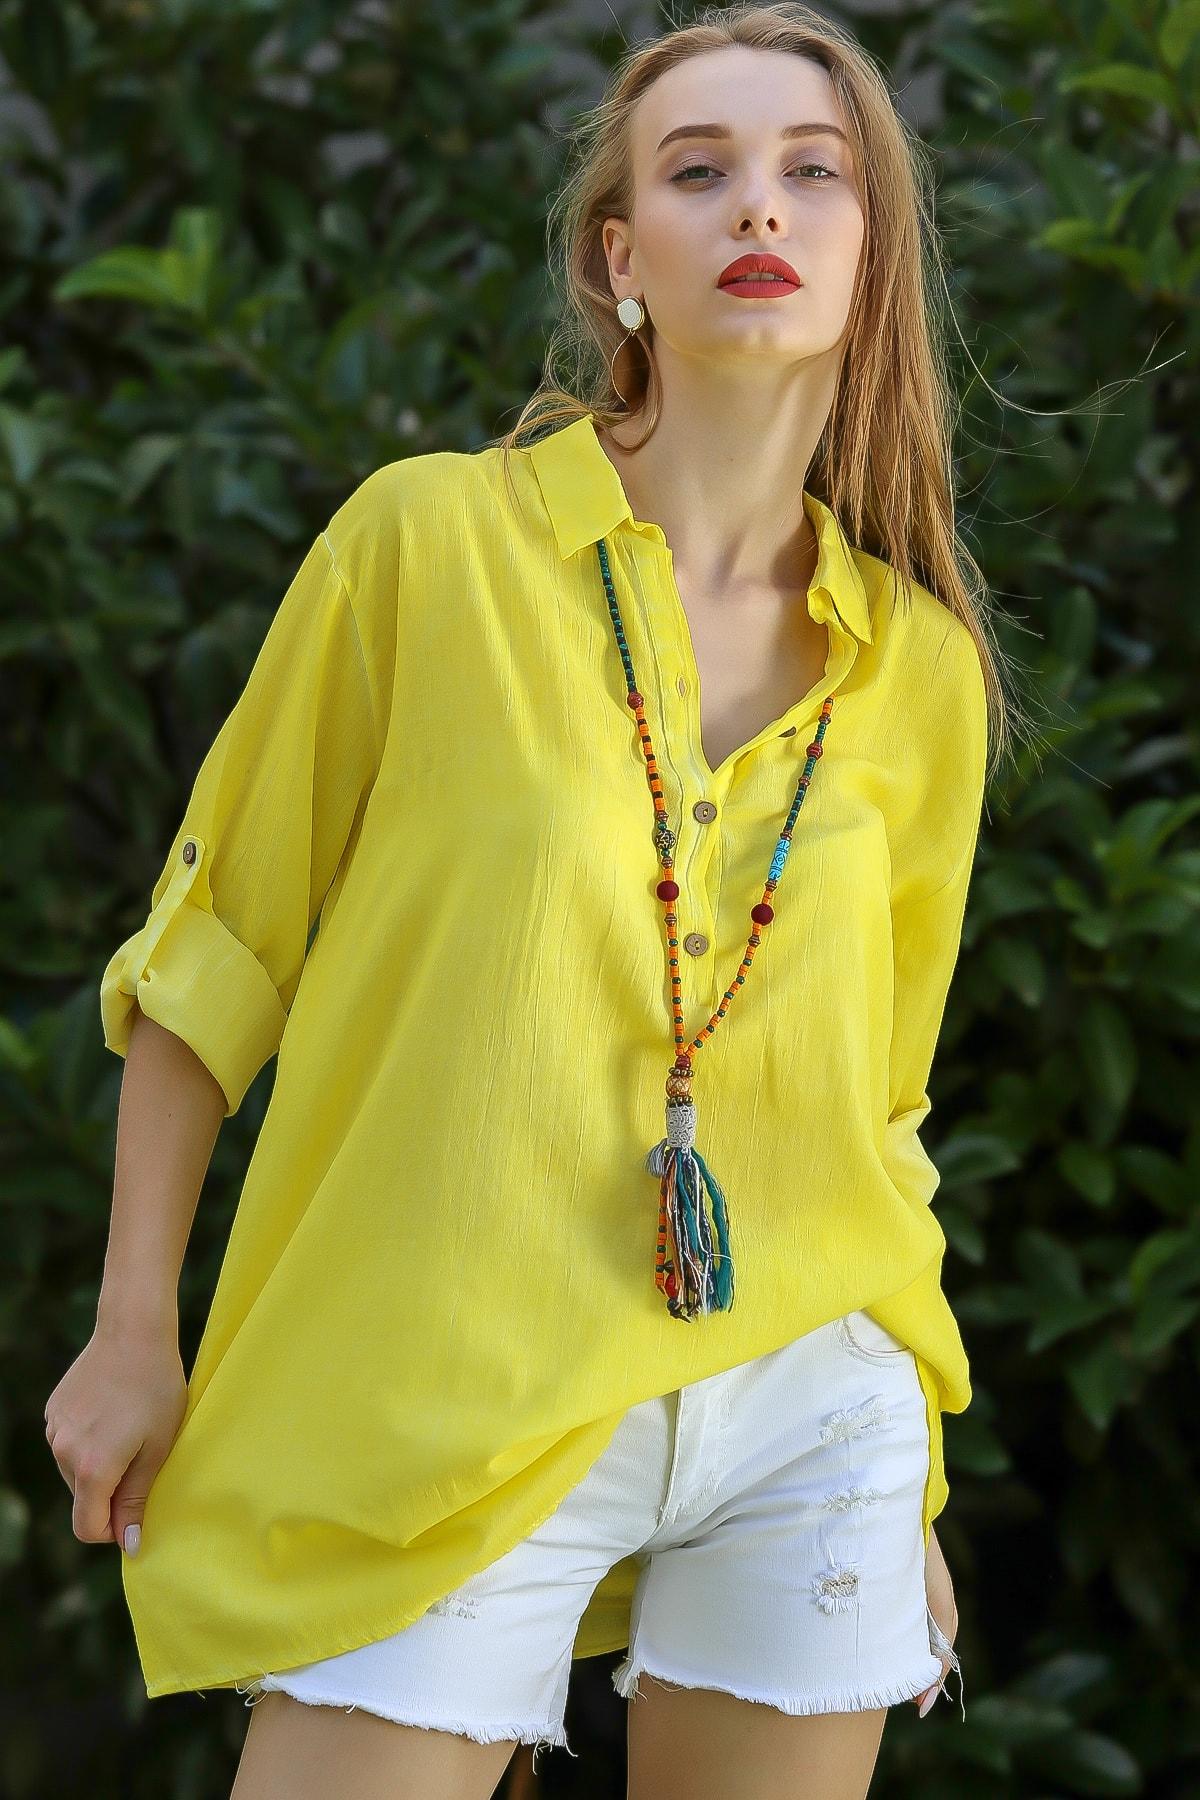 Chiccy Kadın Neon Sarı Casual Gömlek Yaka Pat Detaylı Yıkamalı Tunik Bluz M10010200Bl96076 0